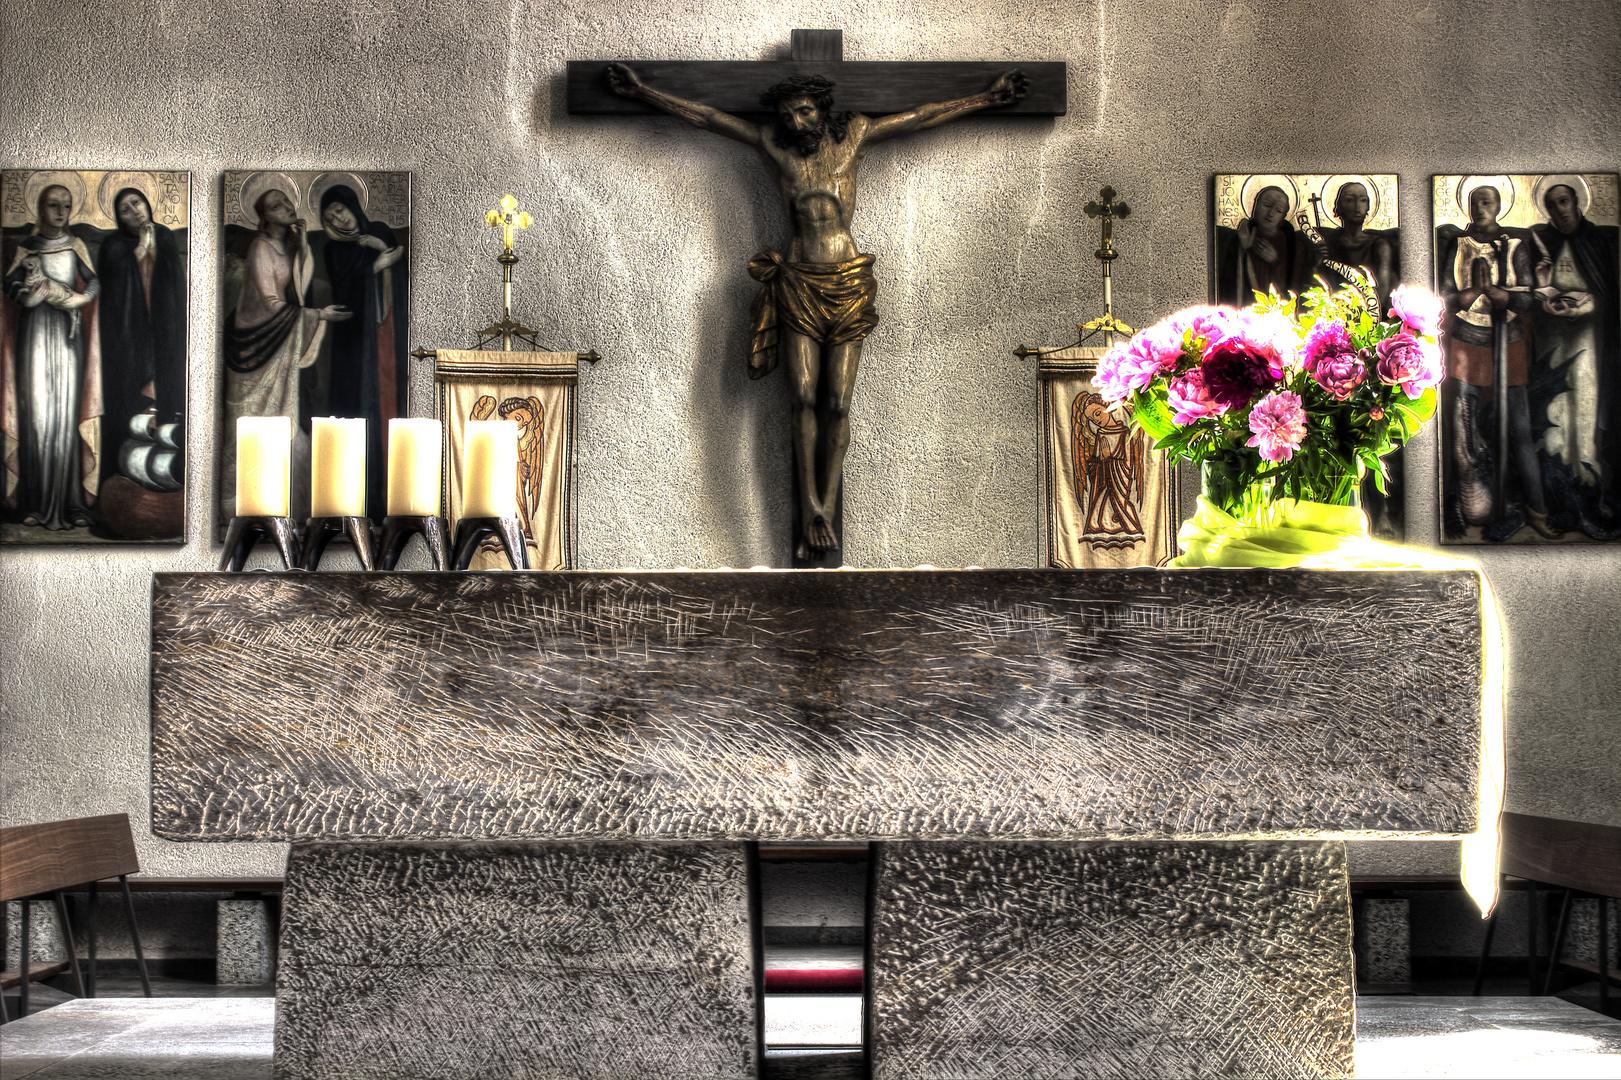 St. Georg Kirche Altar